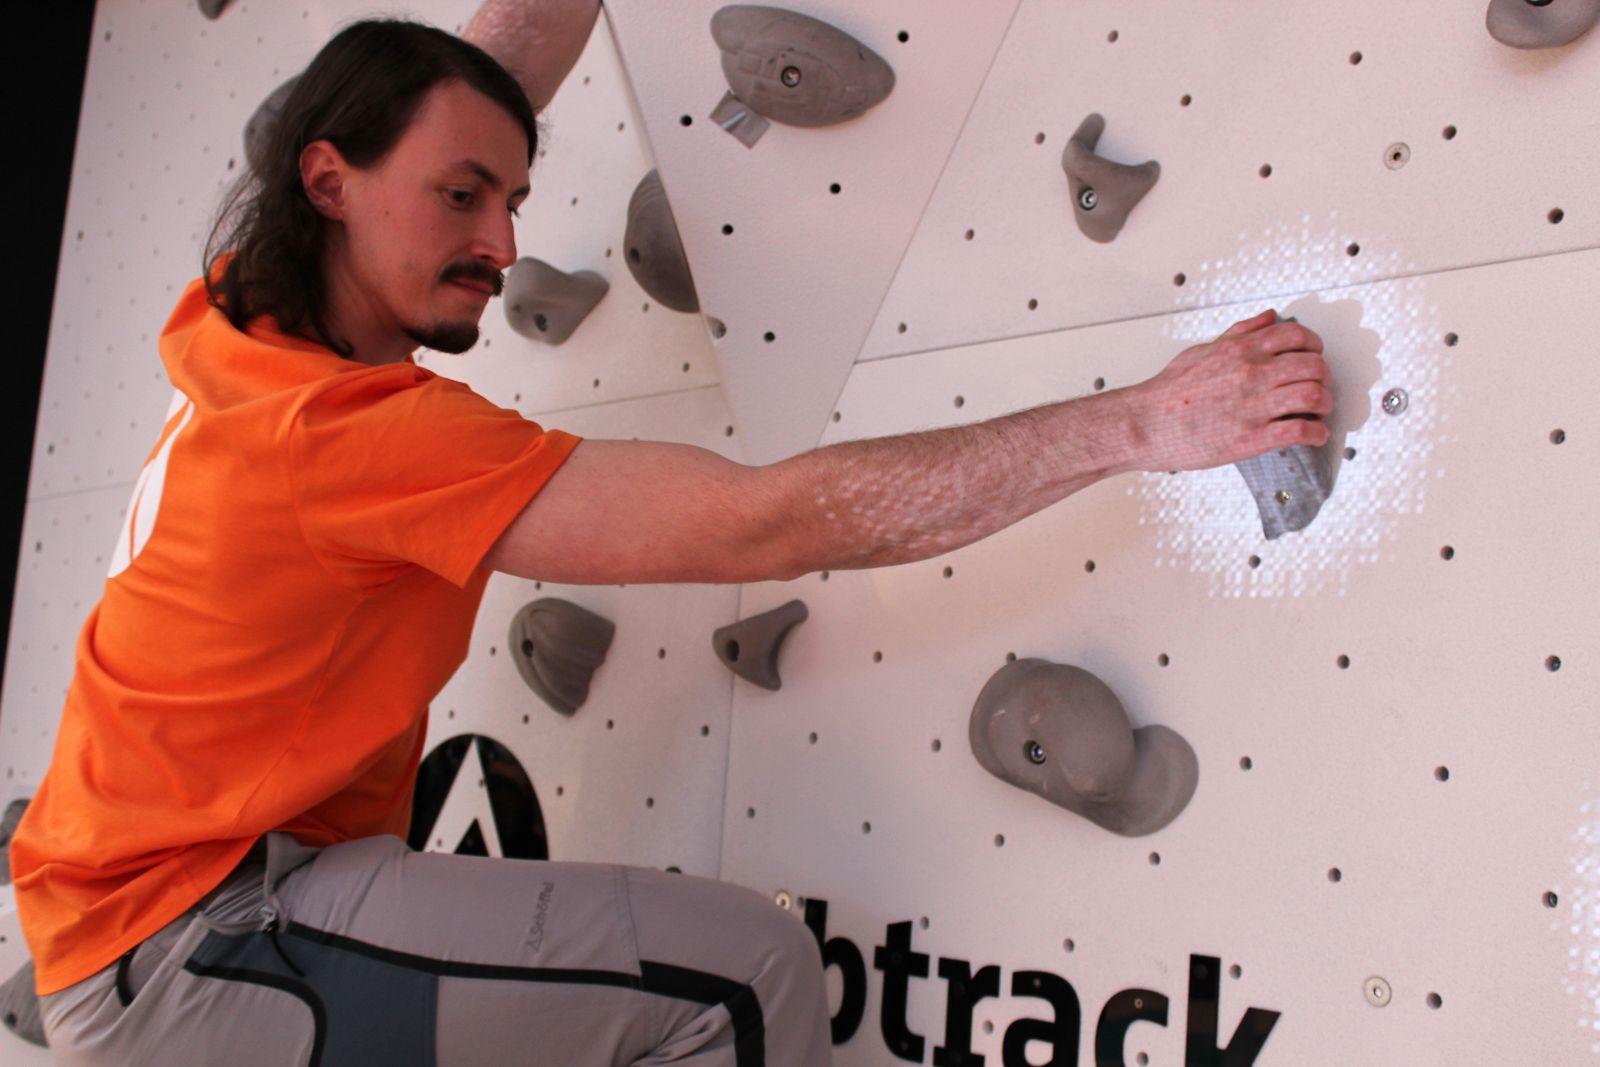 Cebit 2016/ Angela Gruber Bilder/ Climbtrack1